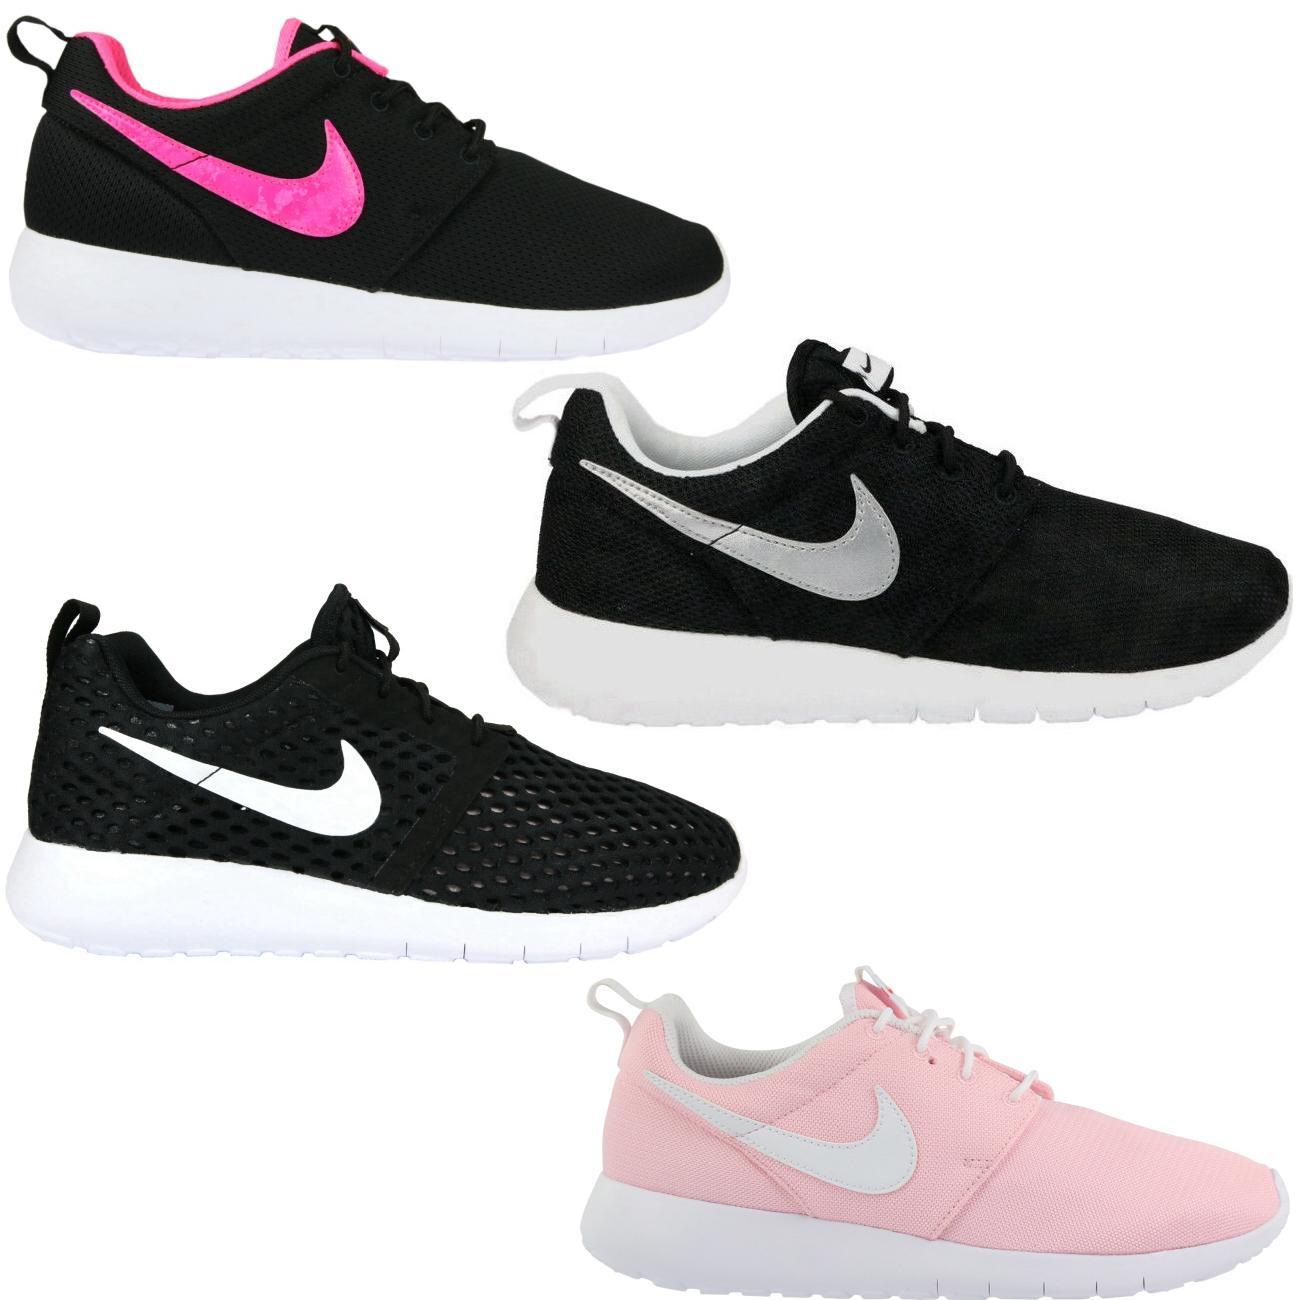 Nike Madchen Sneaker Turnschuhe Sportschuhe